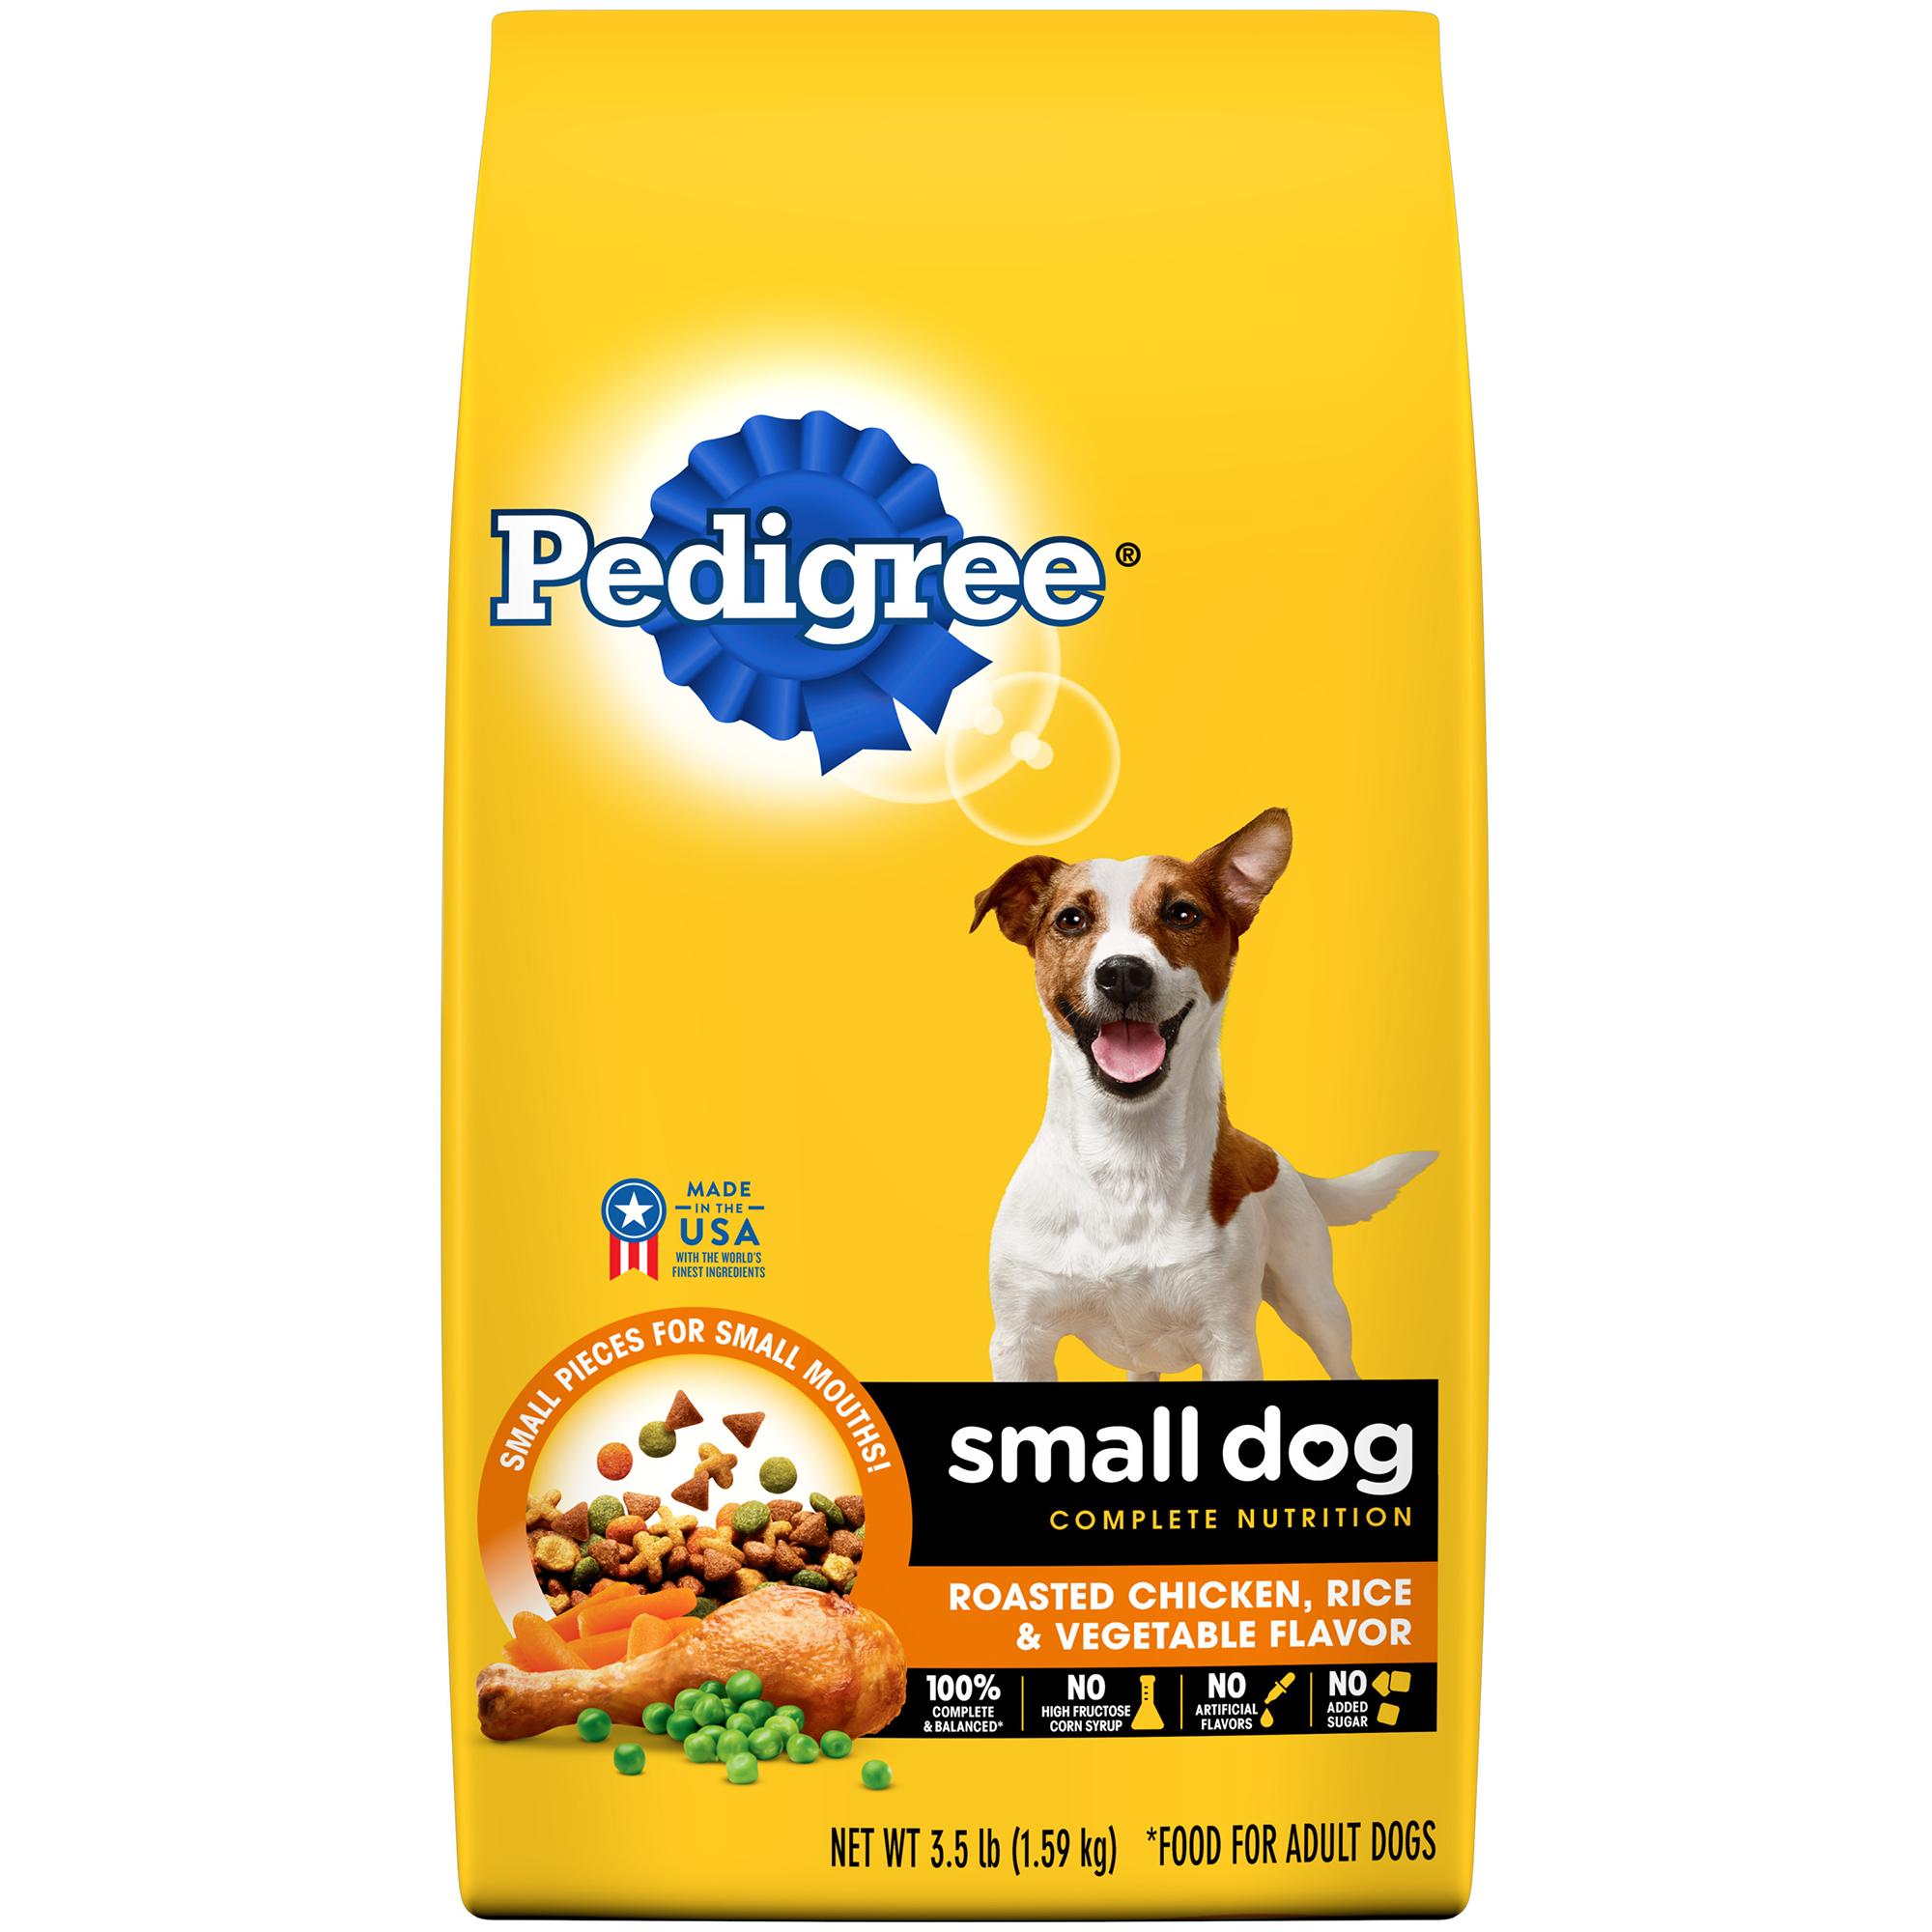 PEDIGREE Small Dog Complete Nutrition Adult Dry Dog Food Roasted Chicken, Rice & Vegetable Flavor, 3.5 lb. Bag